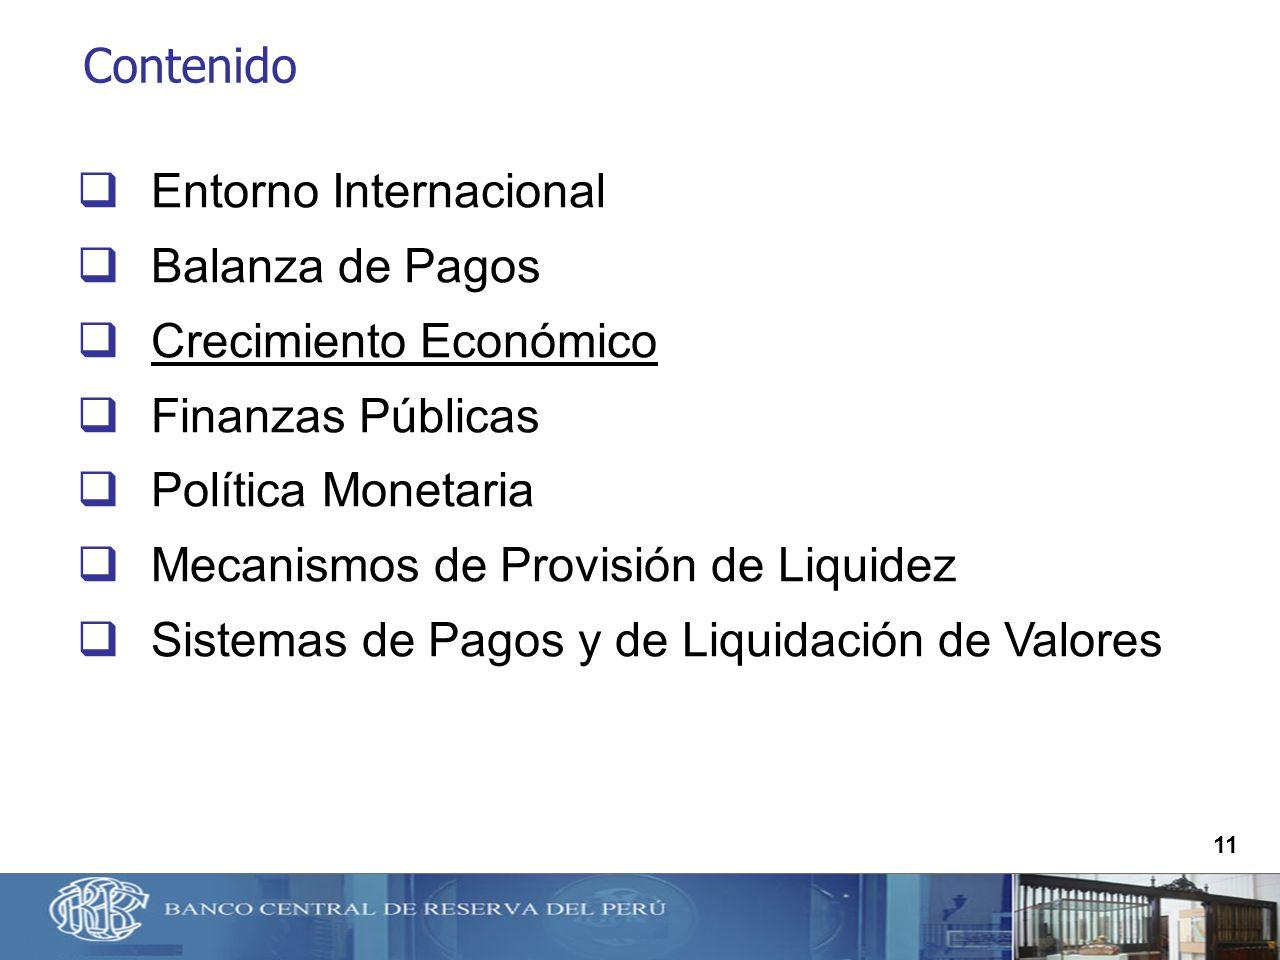 11 Contenido Entorno Internacional Balanza de Pagos Crecimiento Económico Finanzas Públicas Política Monetaria Mecanismos de Provisión de Liquidez Sis